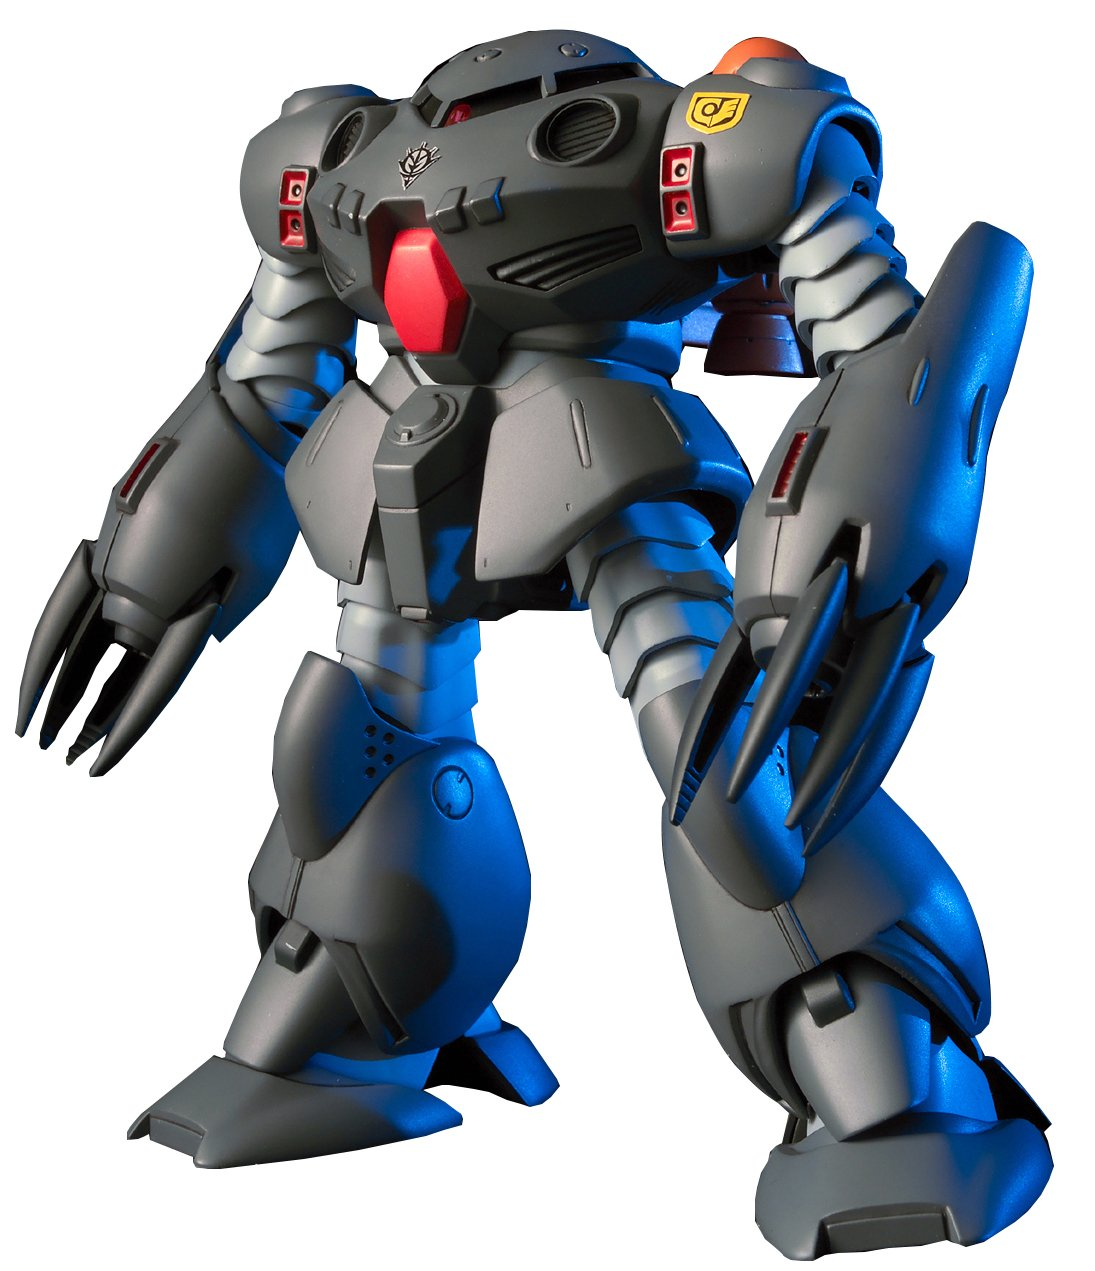 Bandai Hobby #39 ZUGOCK-E, Bandai HGUC Action Figure